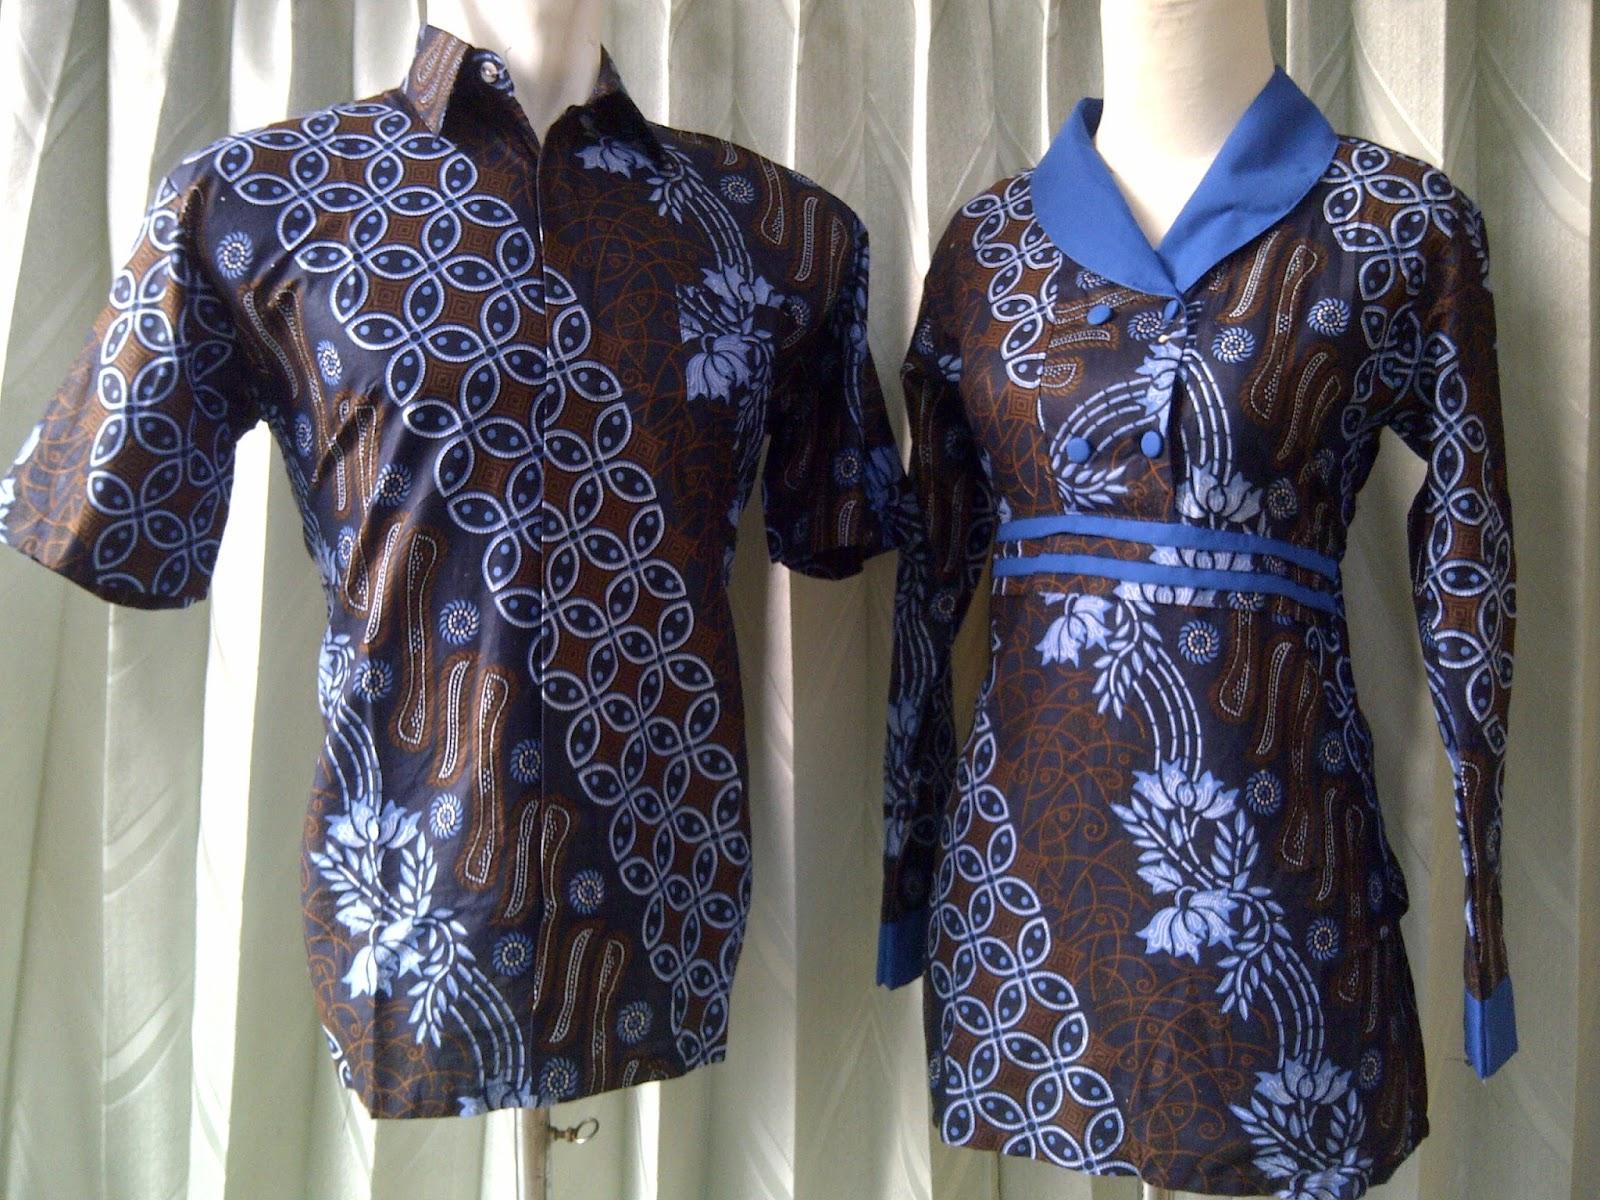 Baju Batik Sarimbit Untuk Lebaran Trend Baju Busana Muslim Modern c9ca4e508c